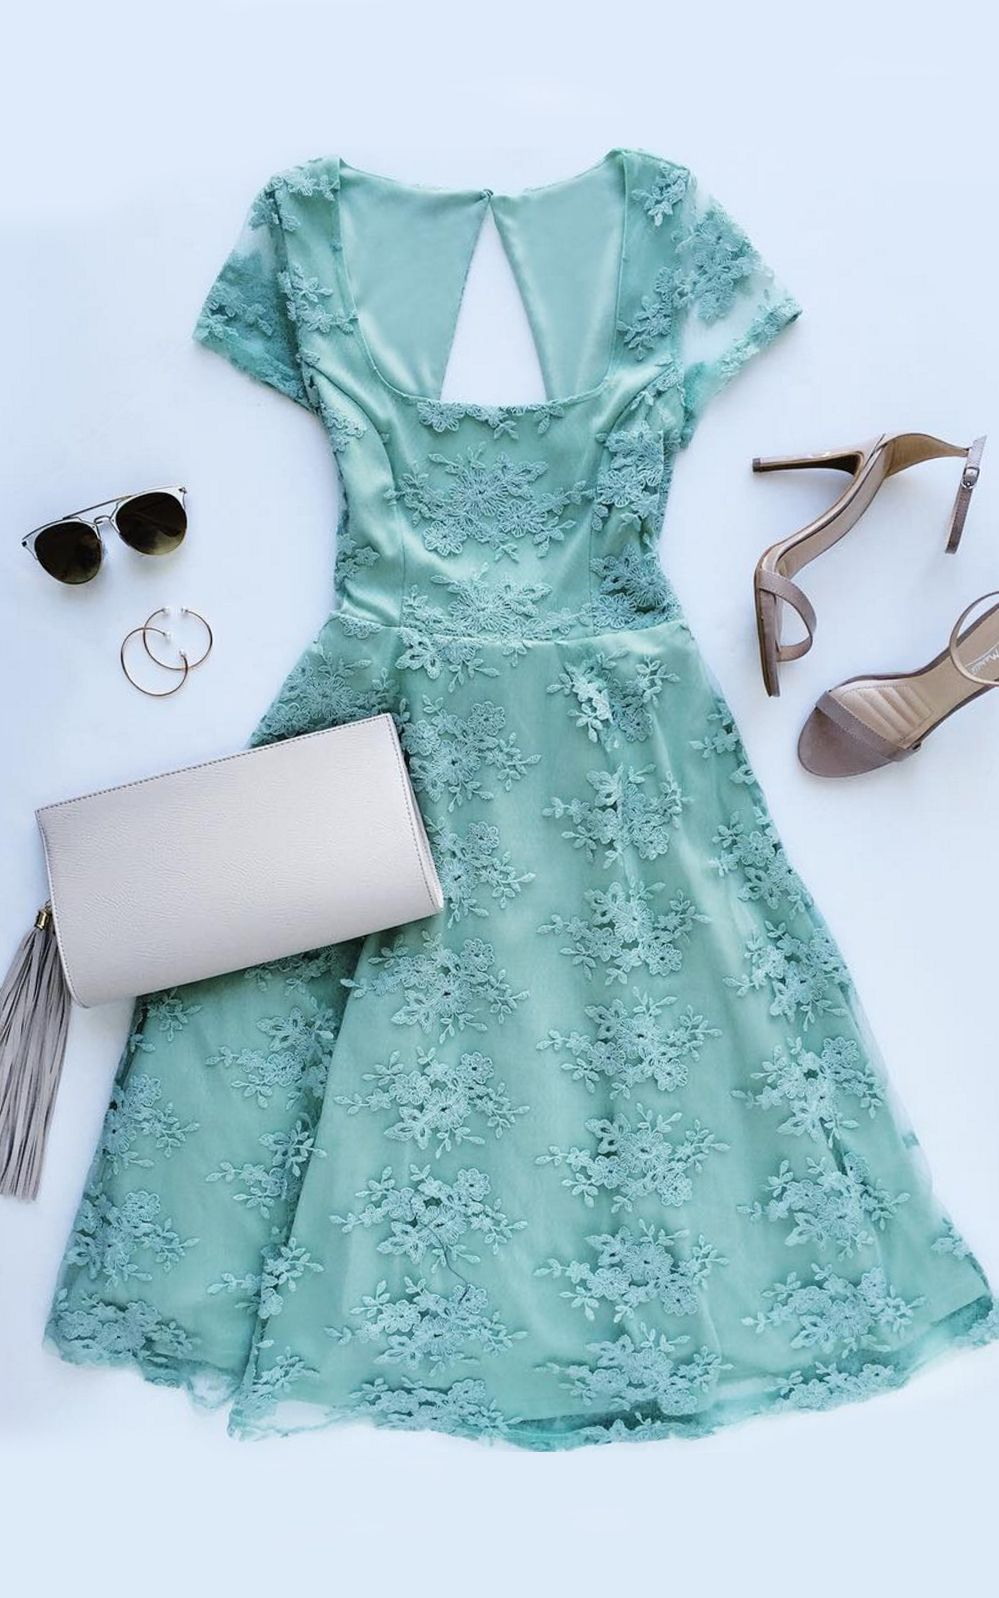 Green short dress for wedding  Sunny Feeling Sage Green Lace Midi Dress  s  Pinterest